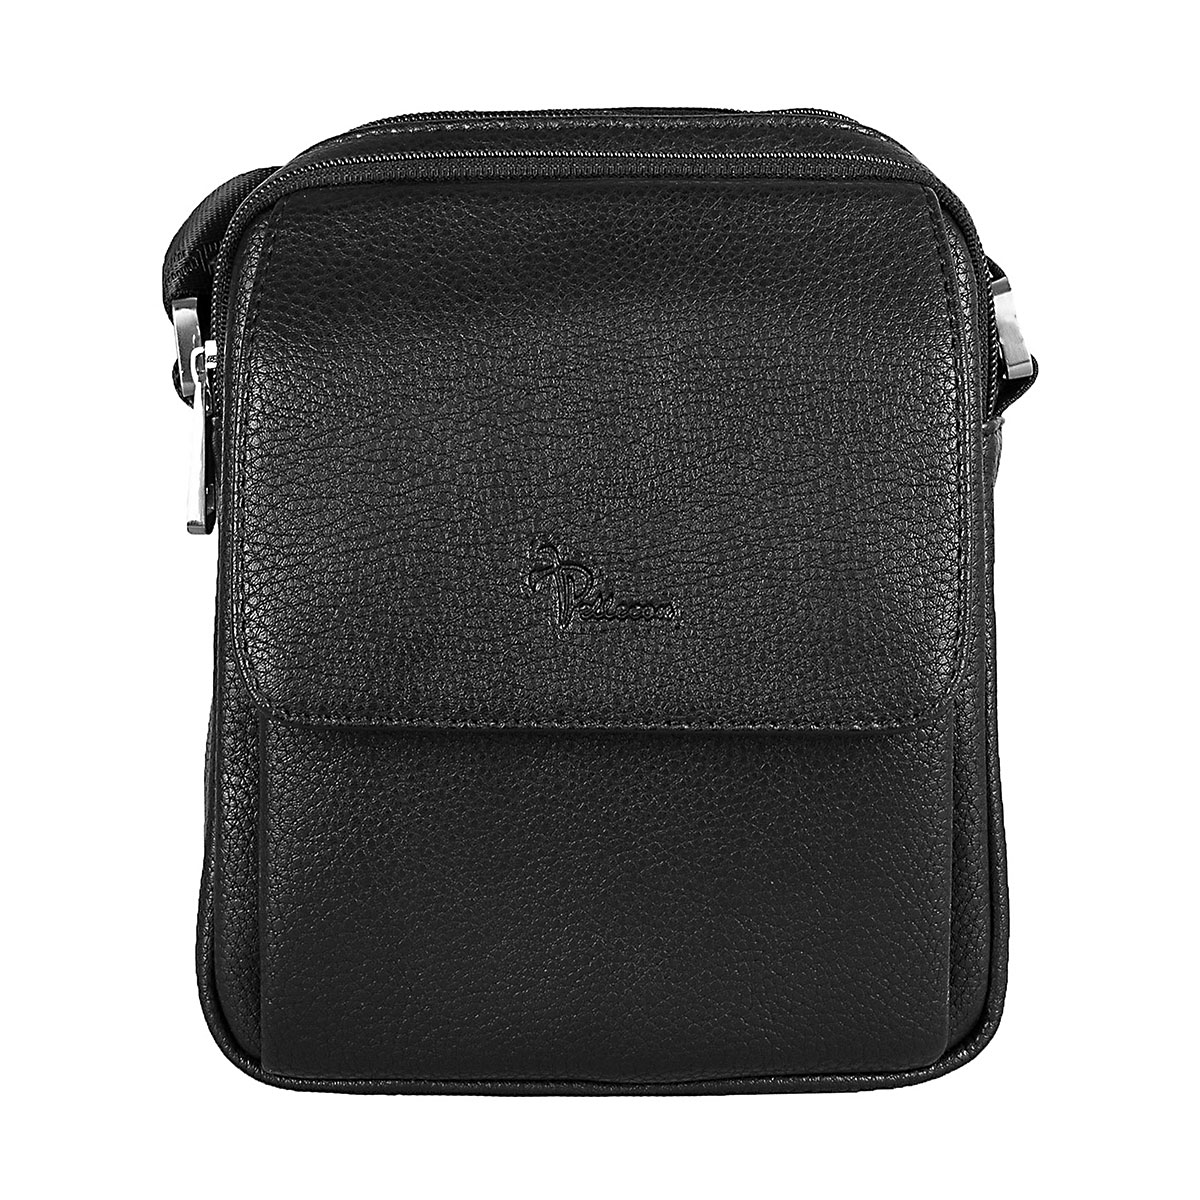 812-81434-1 Men's Bag Pellekon